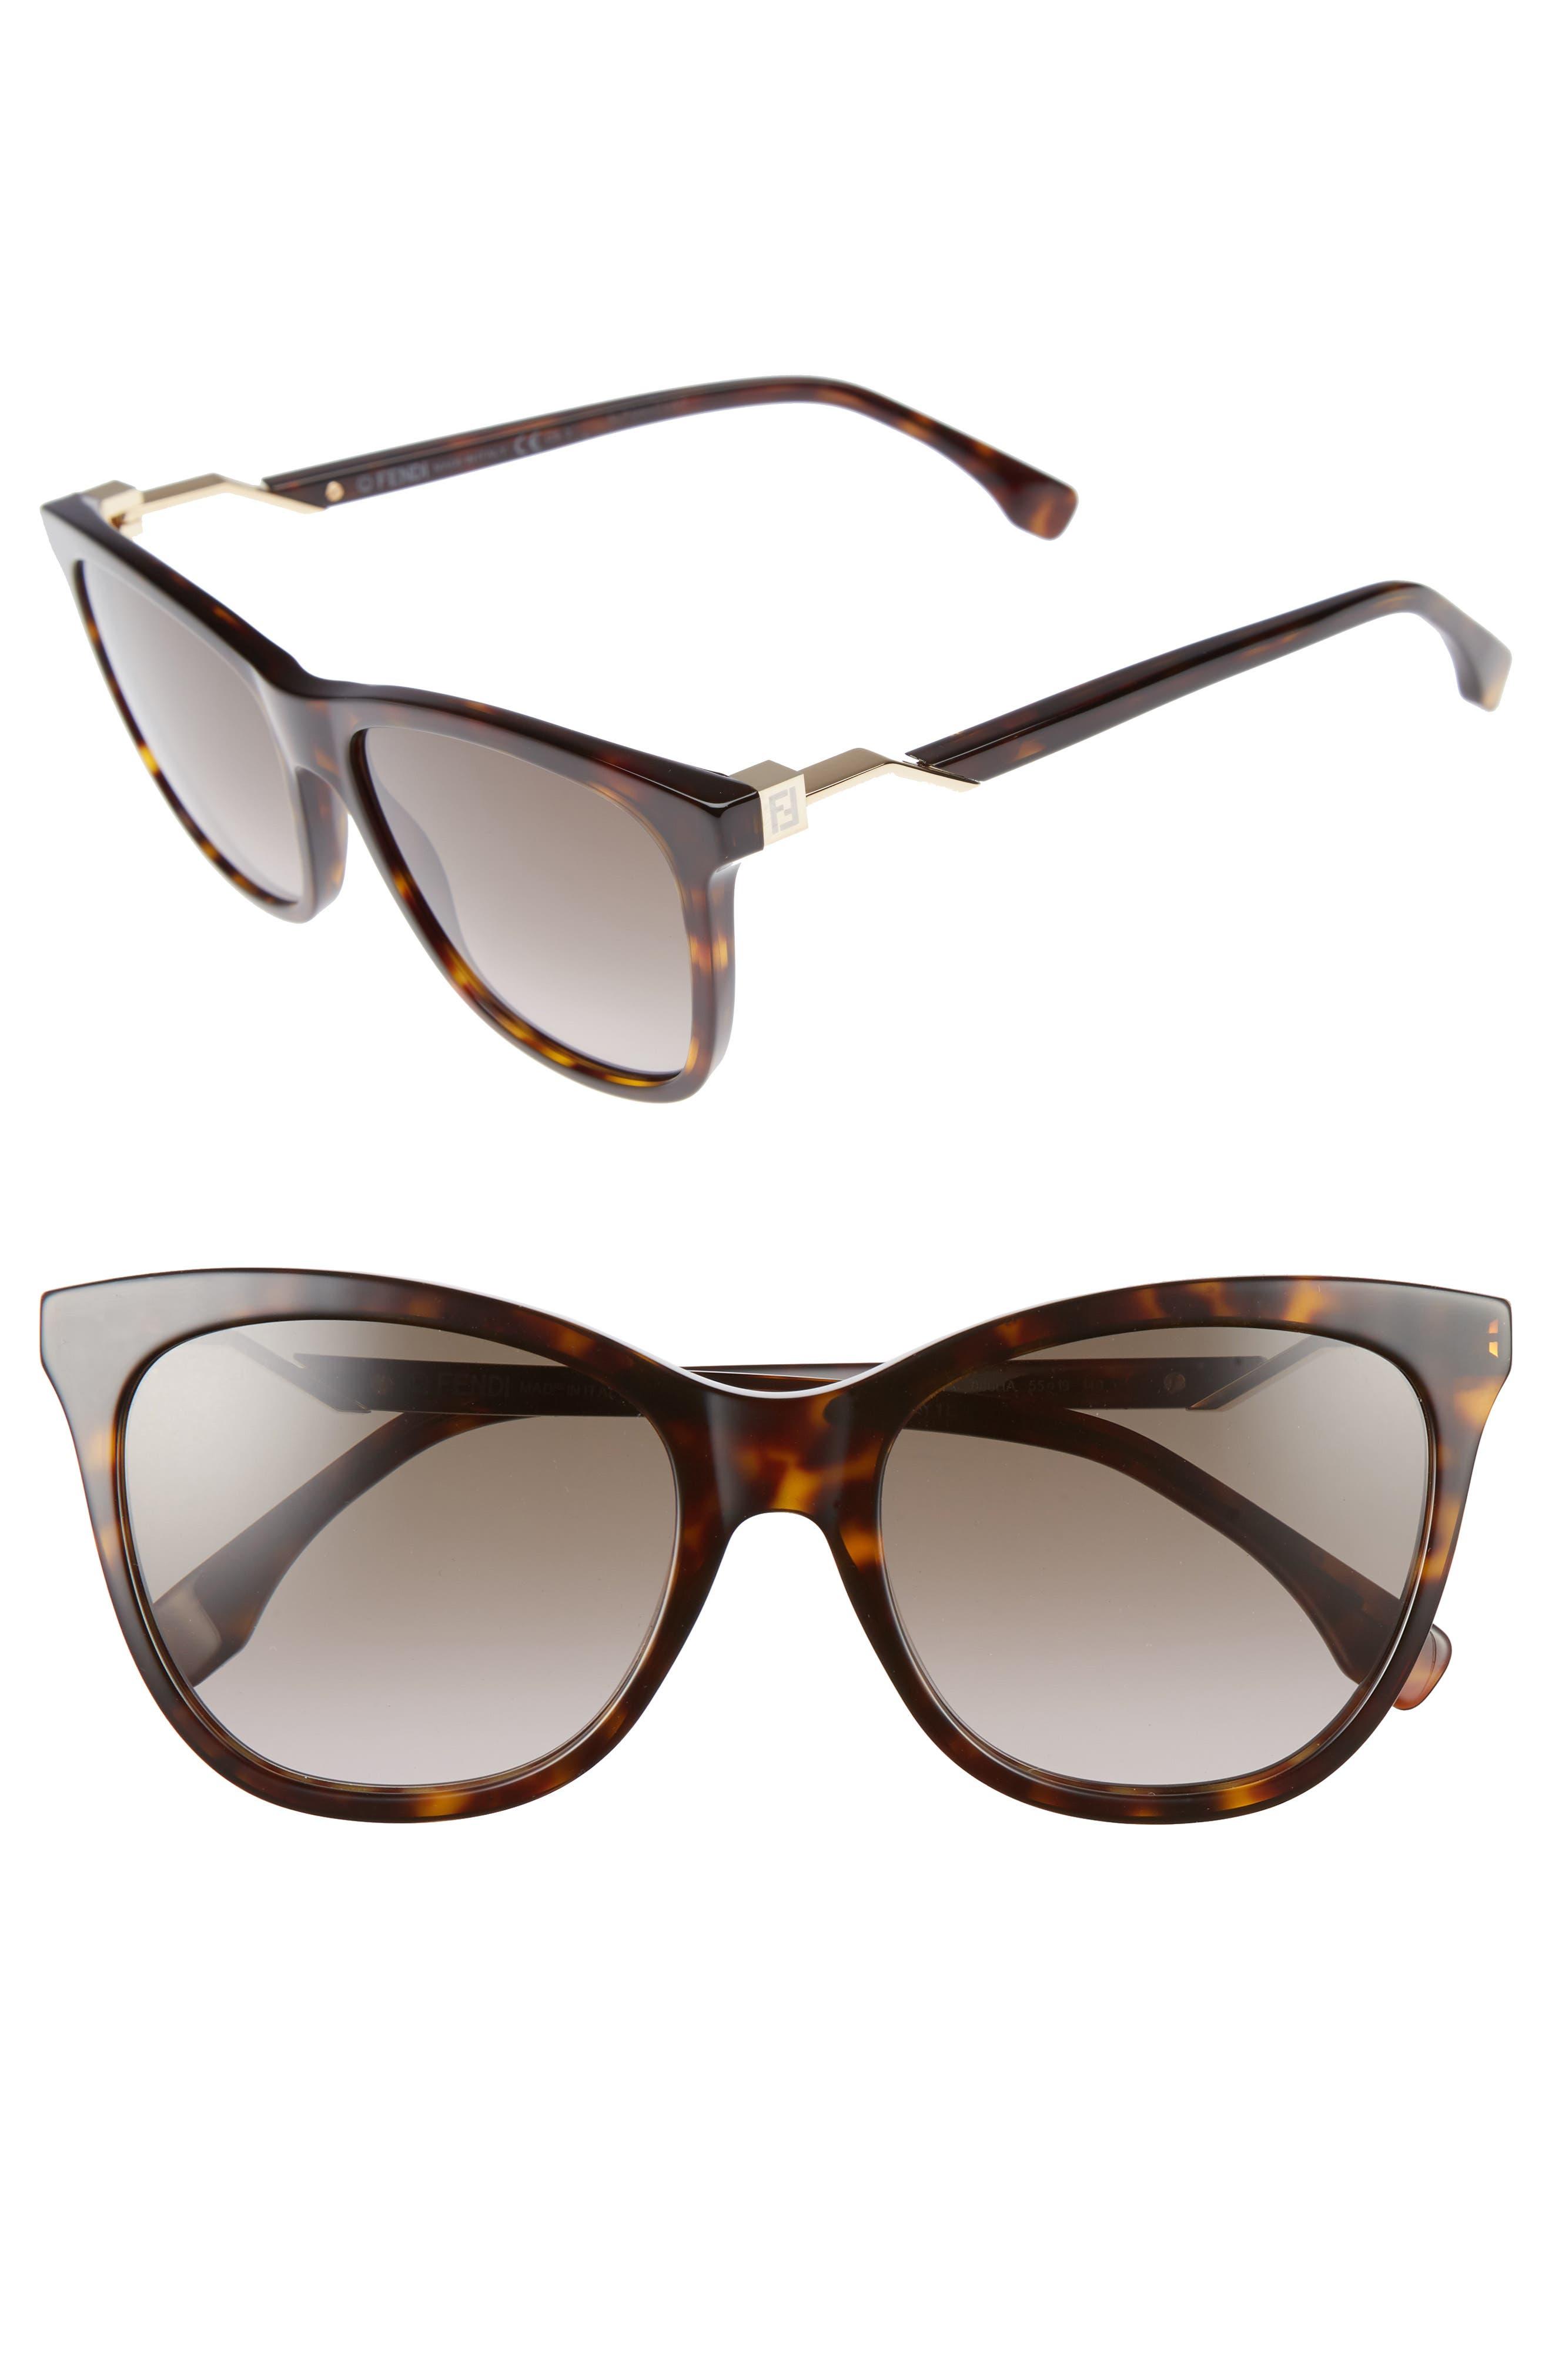 55mm Cube Retro Sunglasses,                             Alternate thumbnail 4, color,